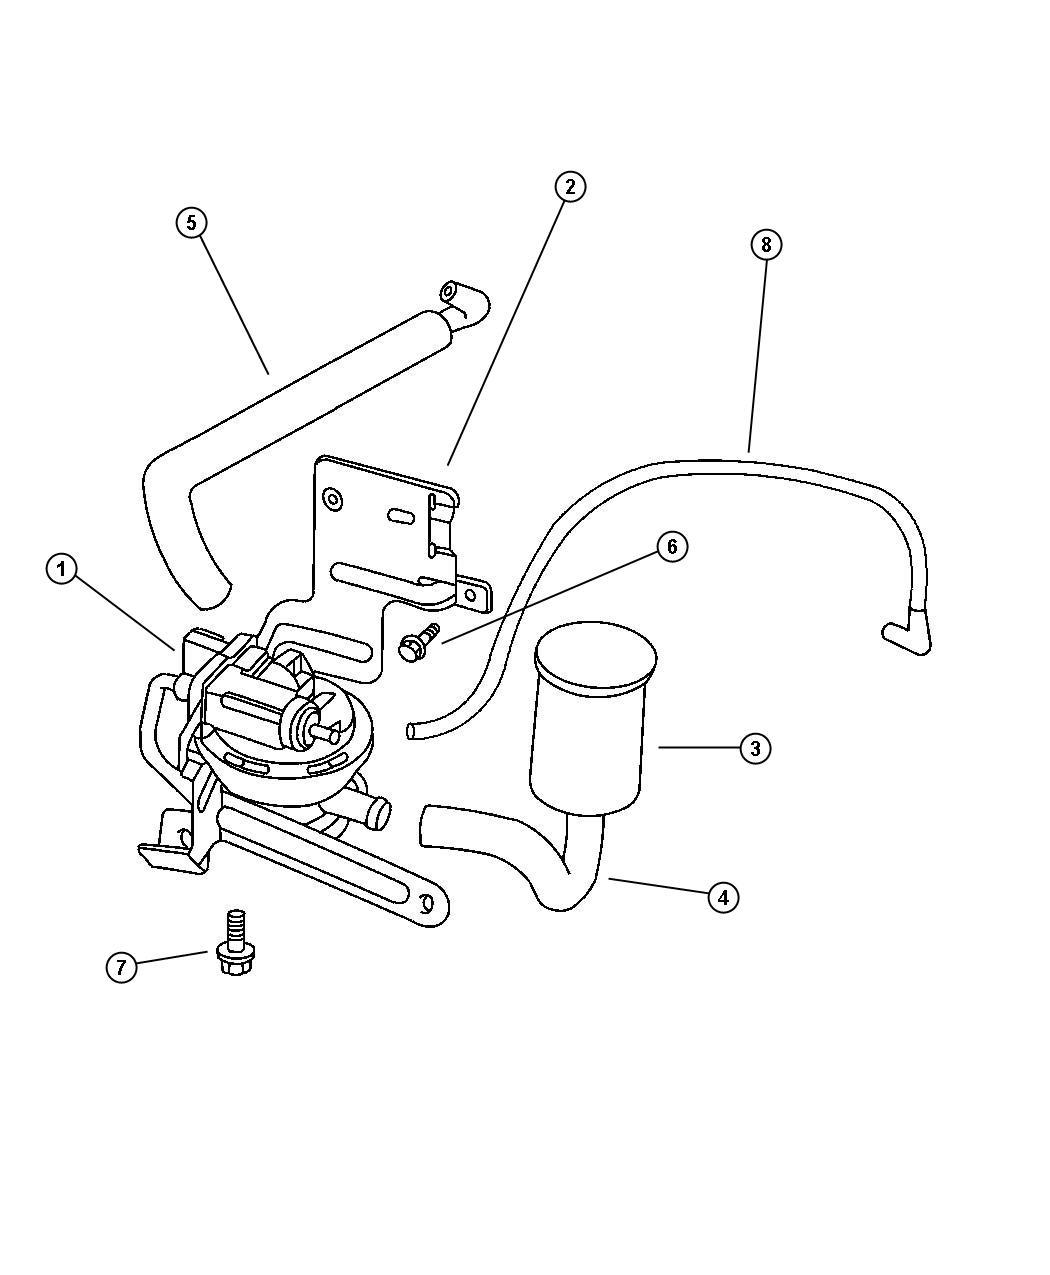 1999 Jeep Cherokee Pump. Leak detection. Emissions